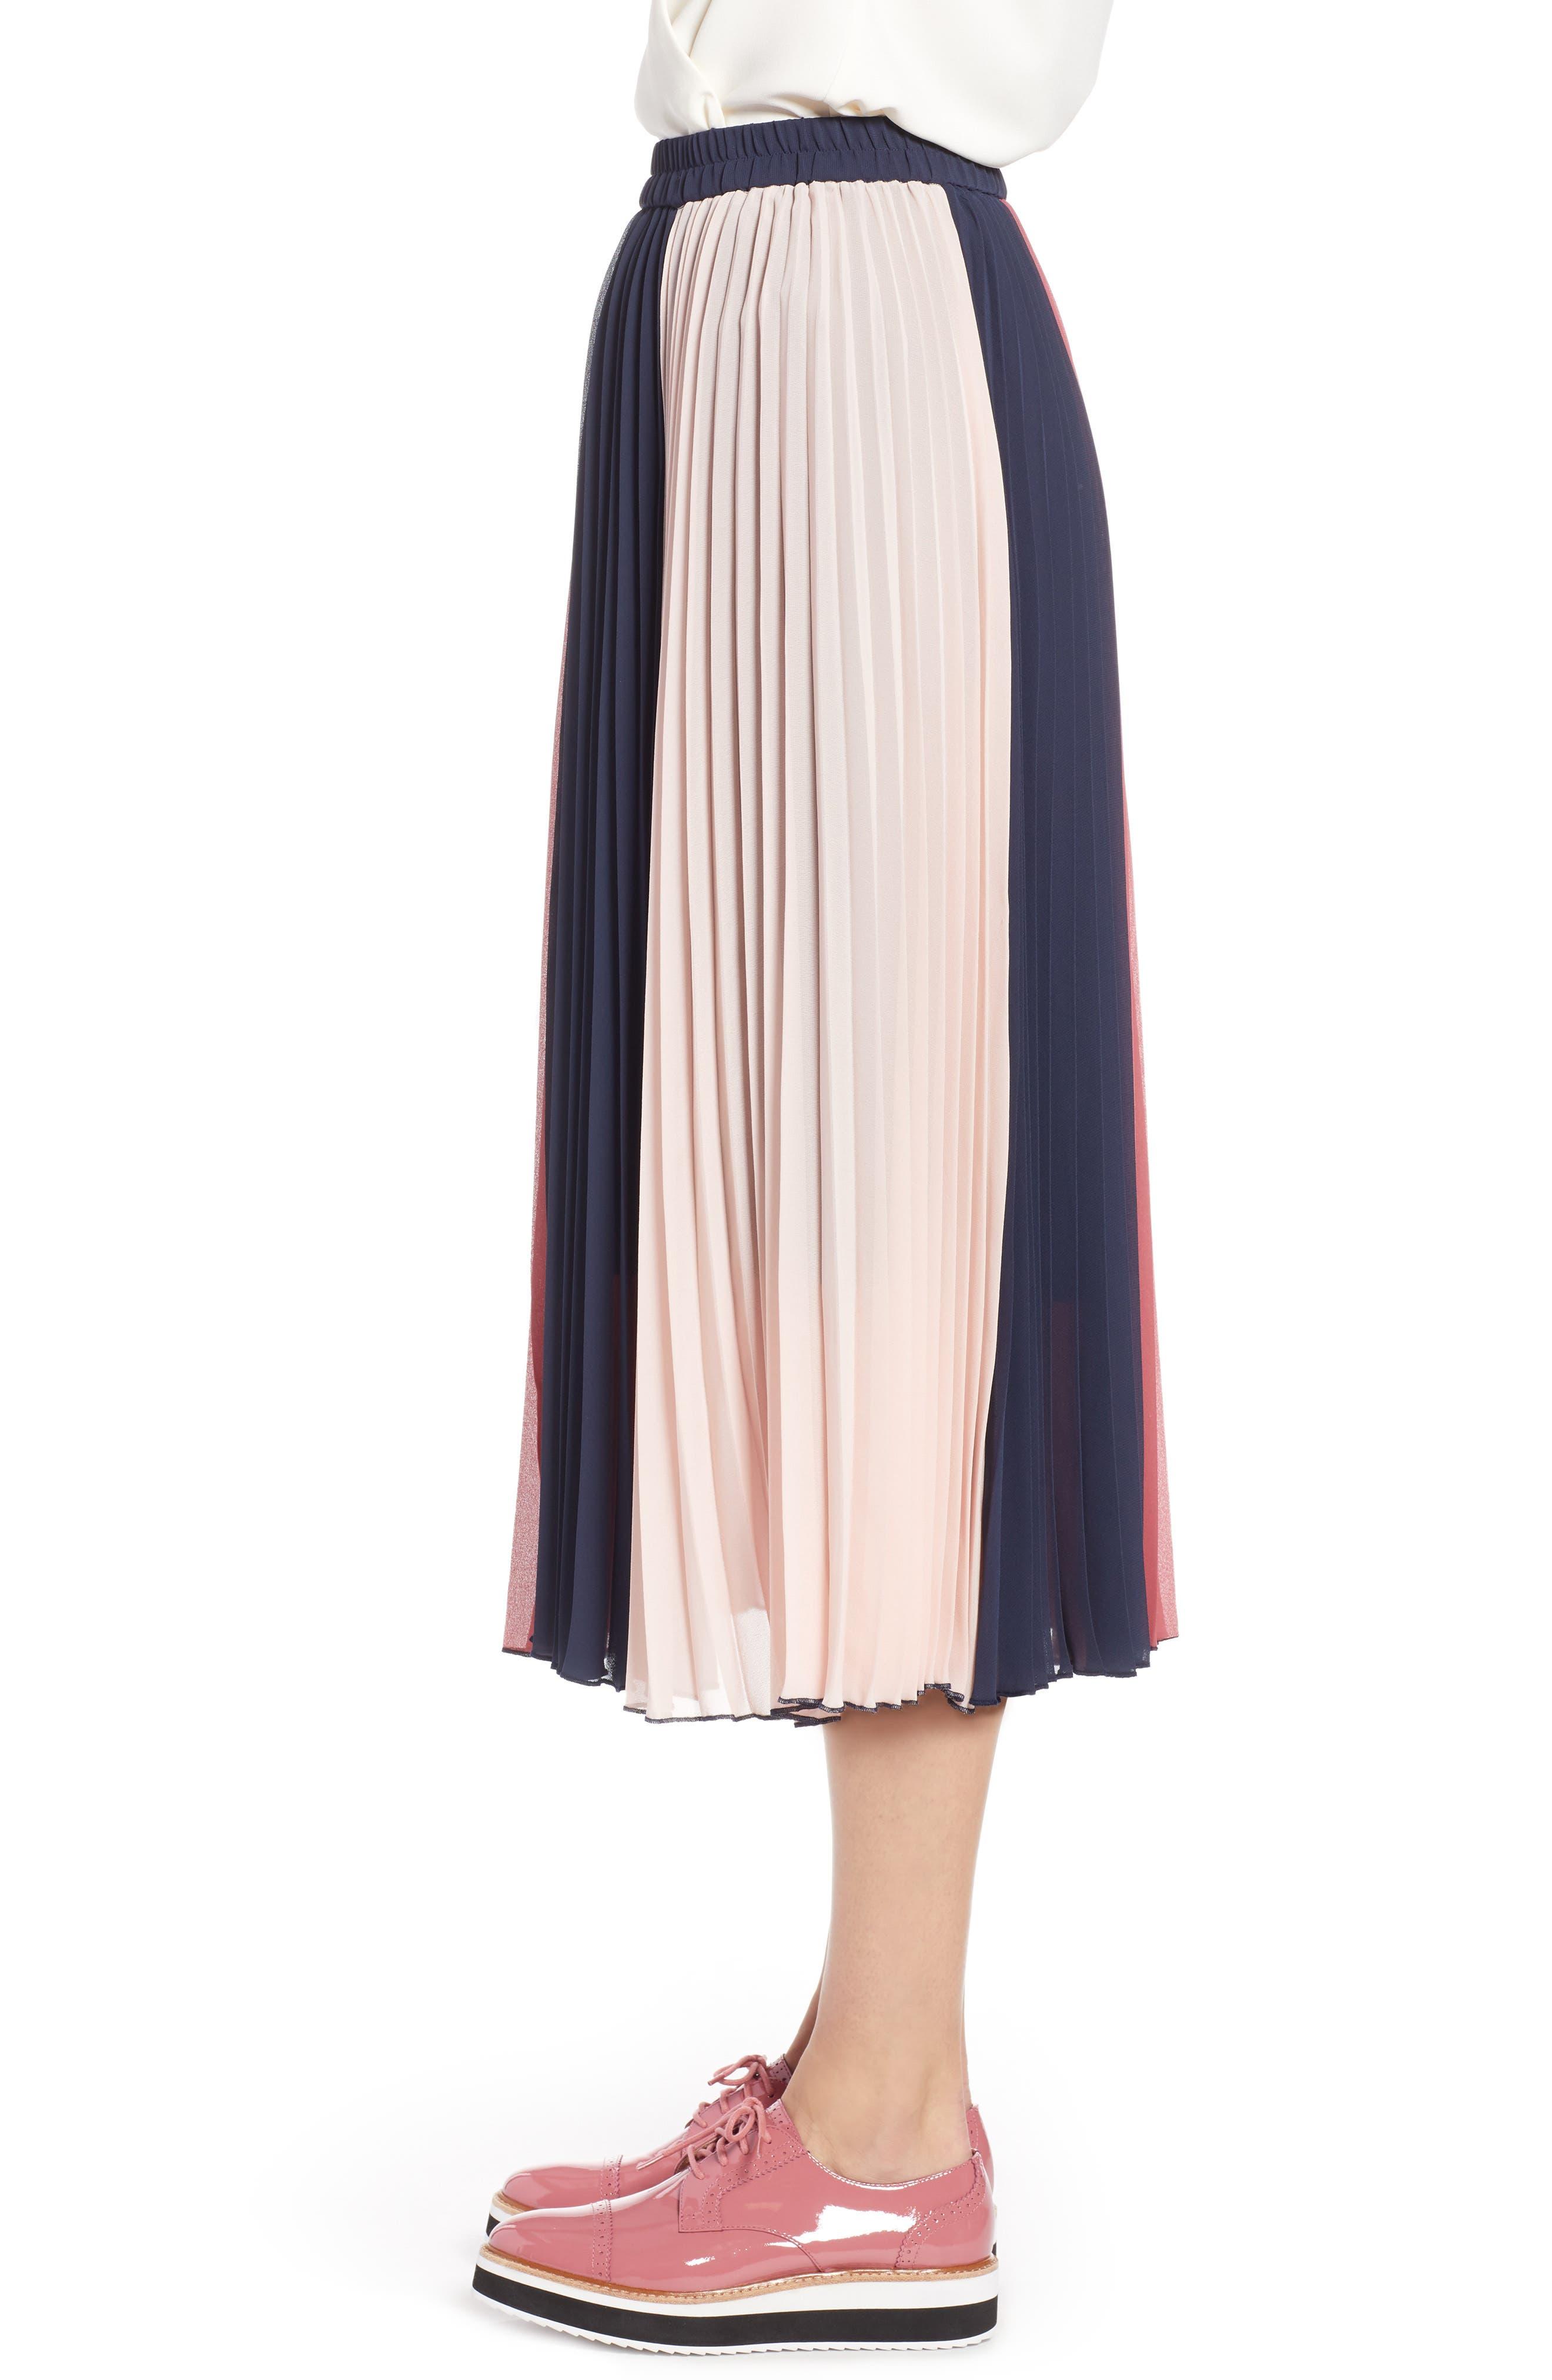 x Atlantic-Pacific Colorblock Pleated Midi Skirt,                             Alternate thumbnail 4, color,                             PINK- NAVY COLORBLOCK